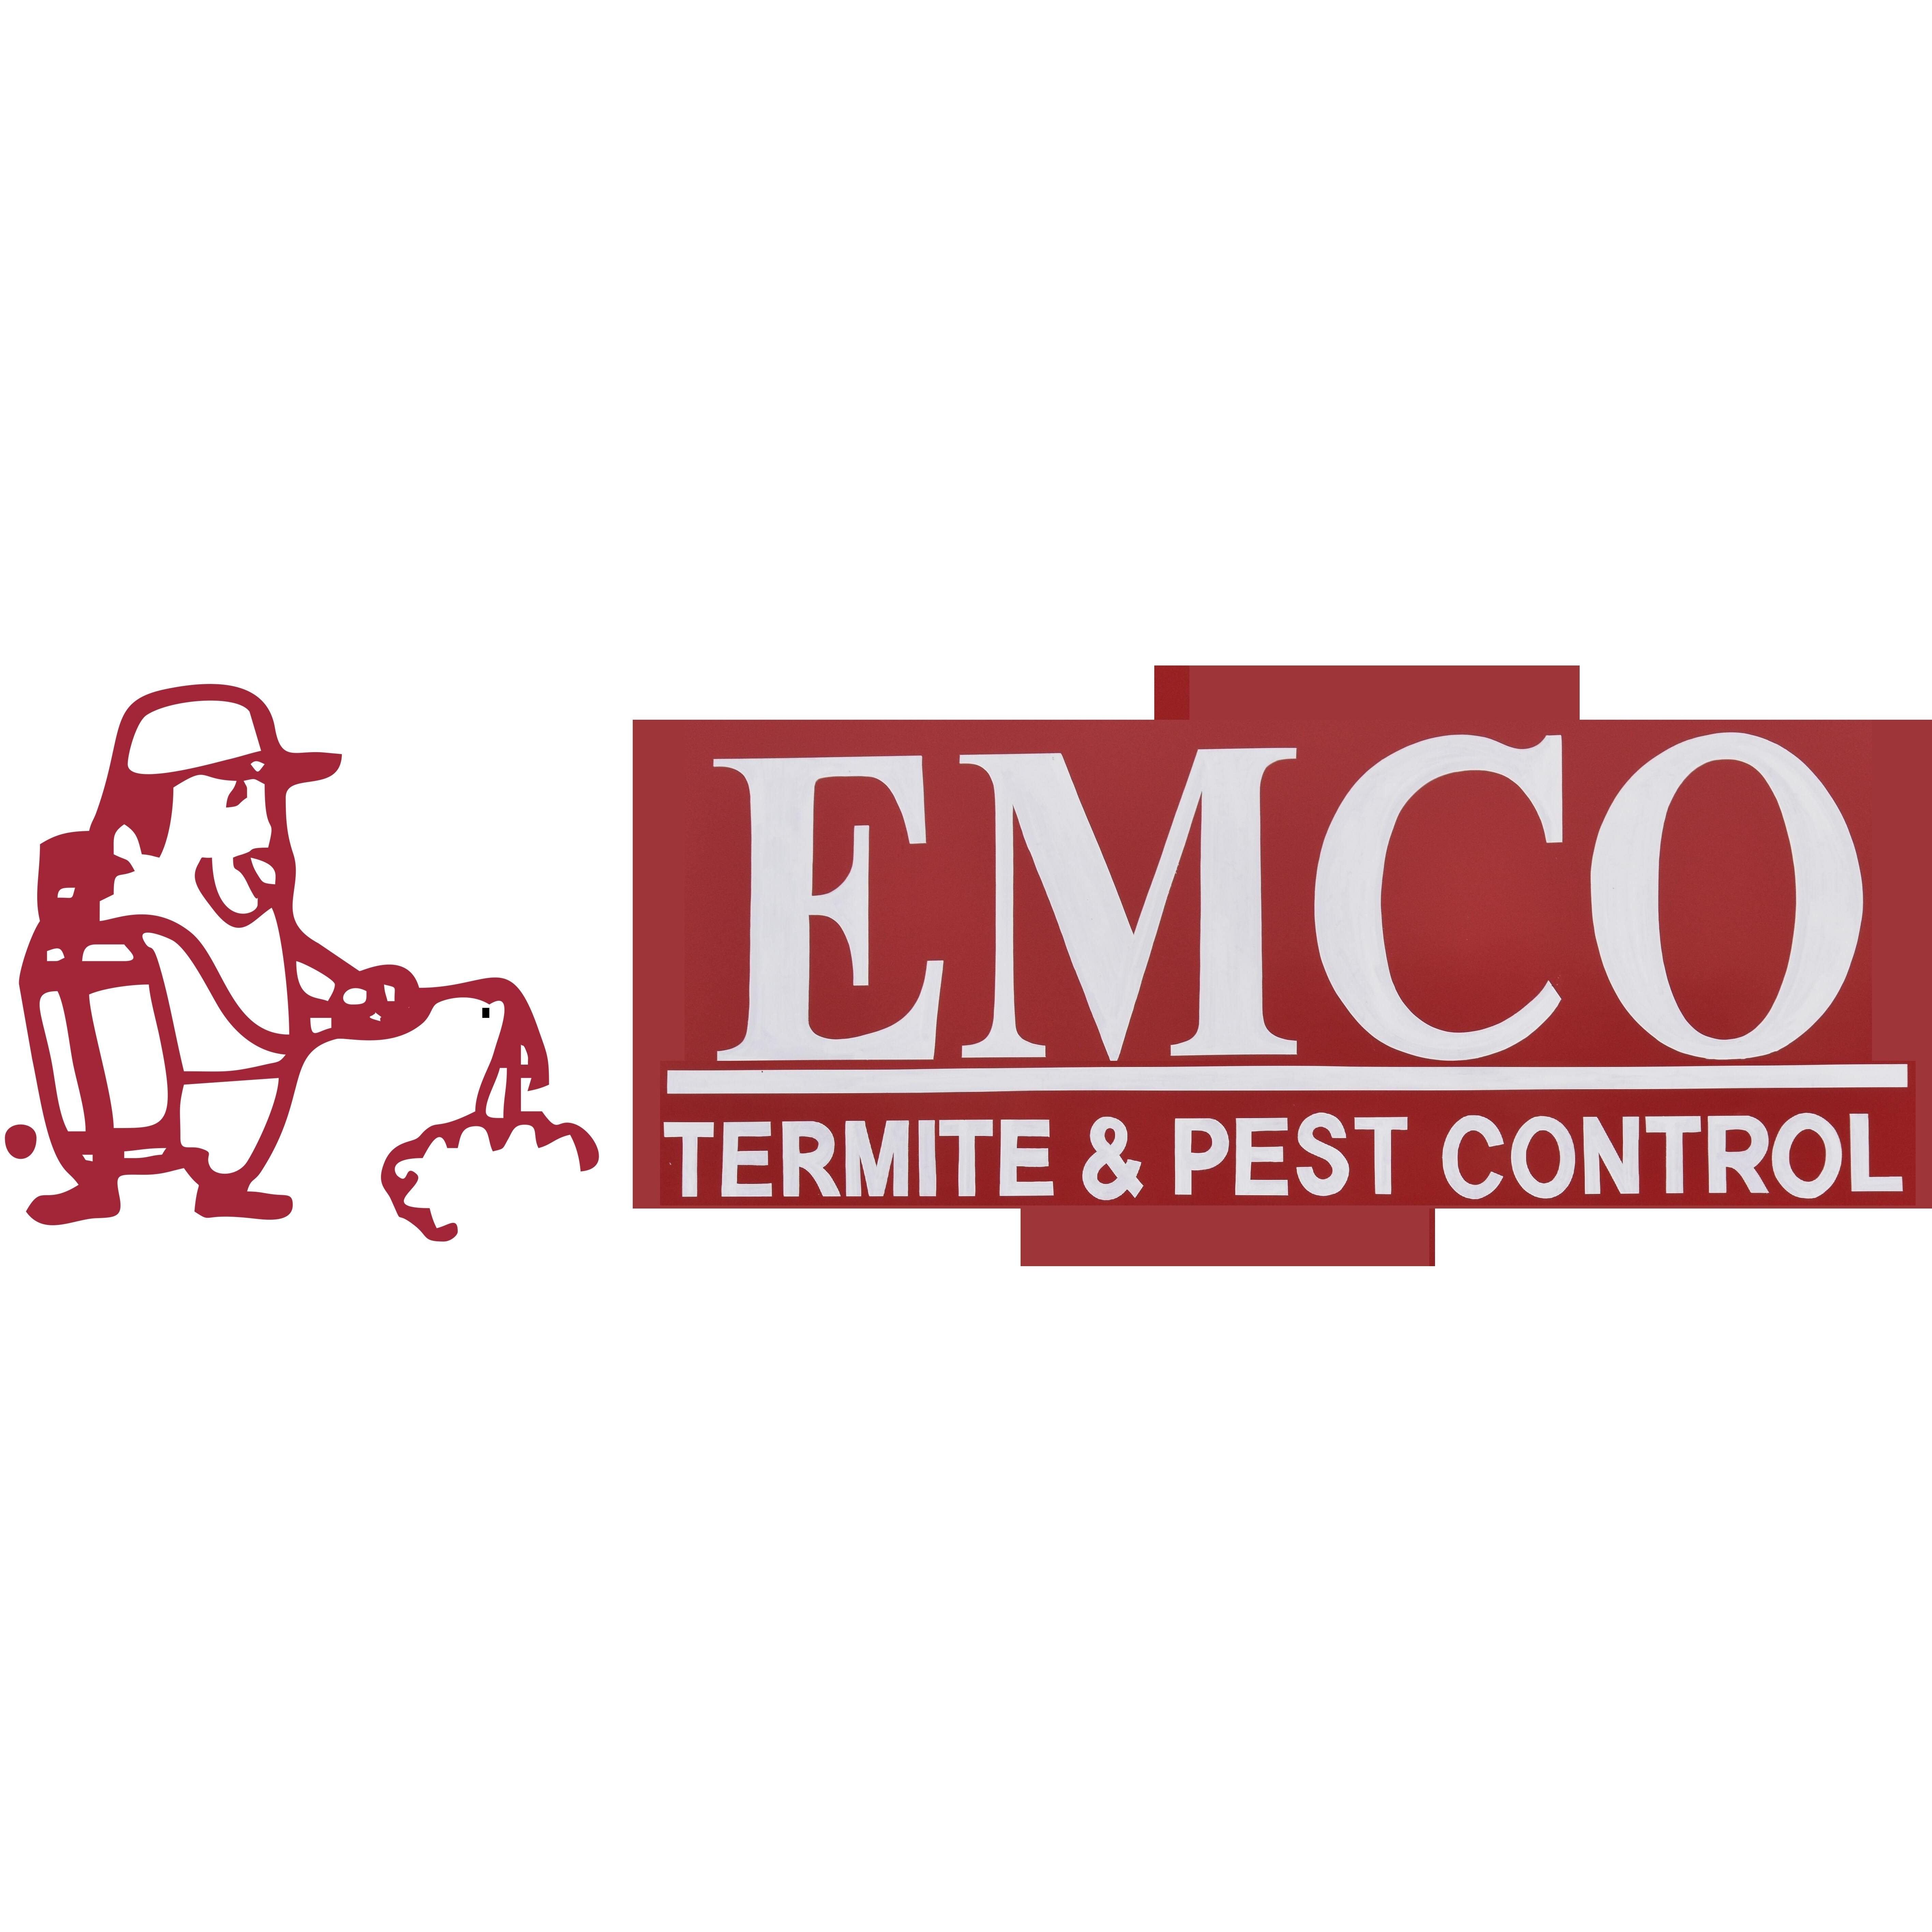 EMCO Termite and Pest Control of Tulsa